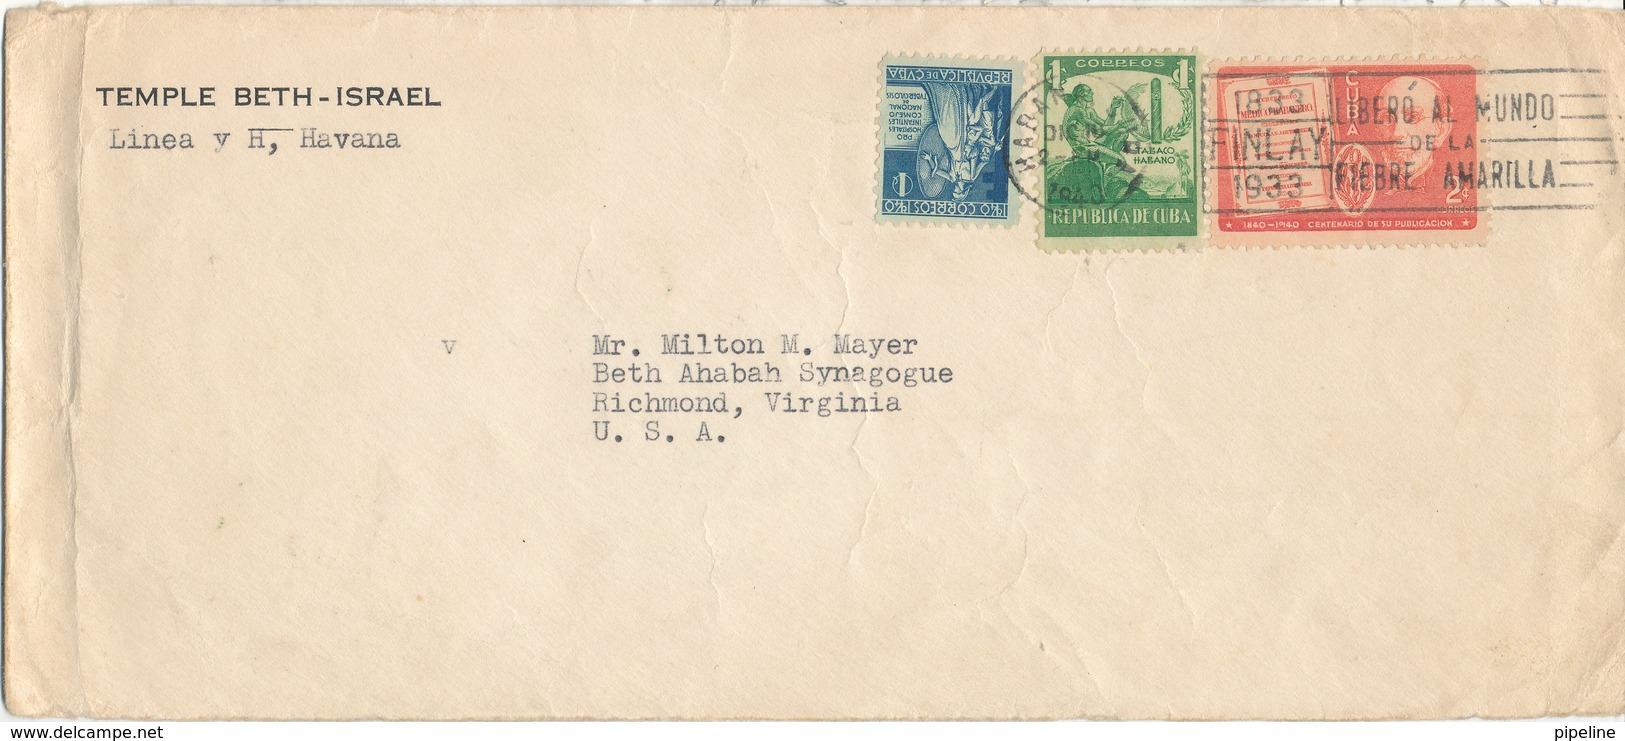 Cuba Cover (TEMPLE BETH - ISRAEL) Sent To USA Habana 16-12-1940 - Cuba